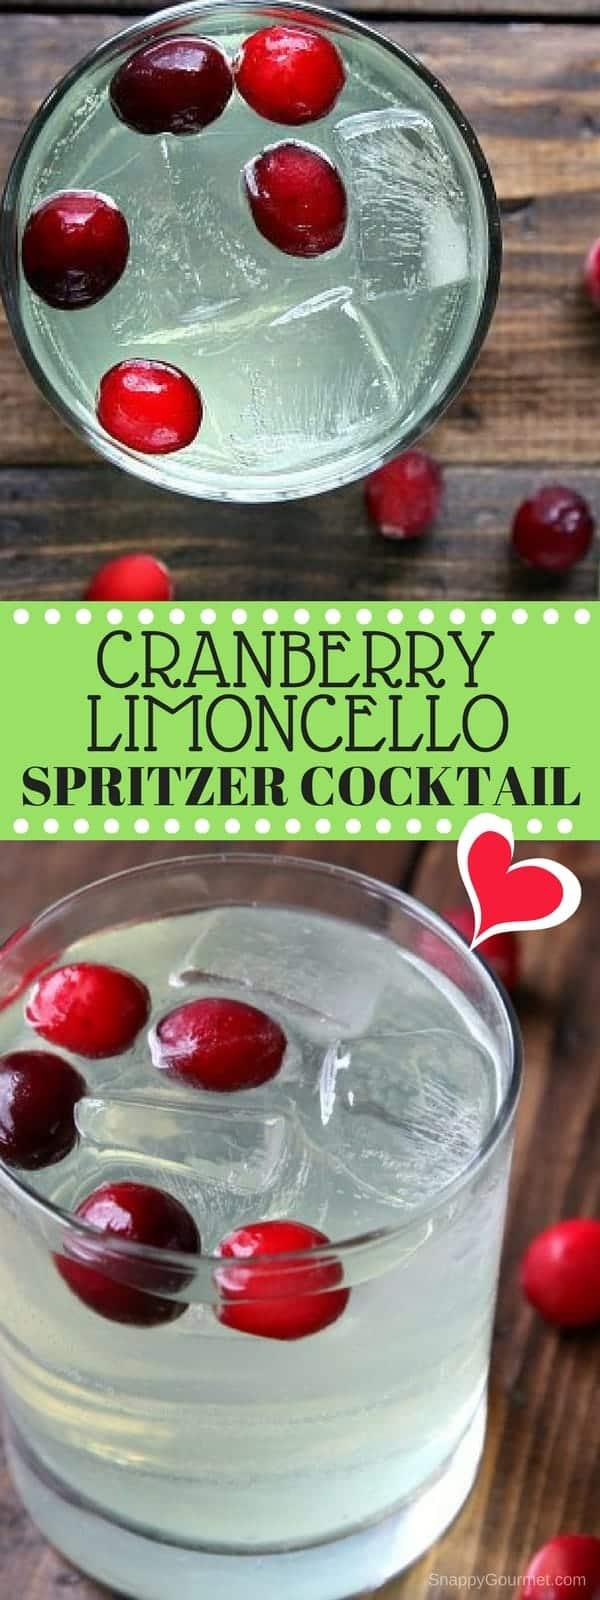 cranberry limoncello spritzer collage